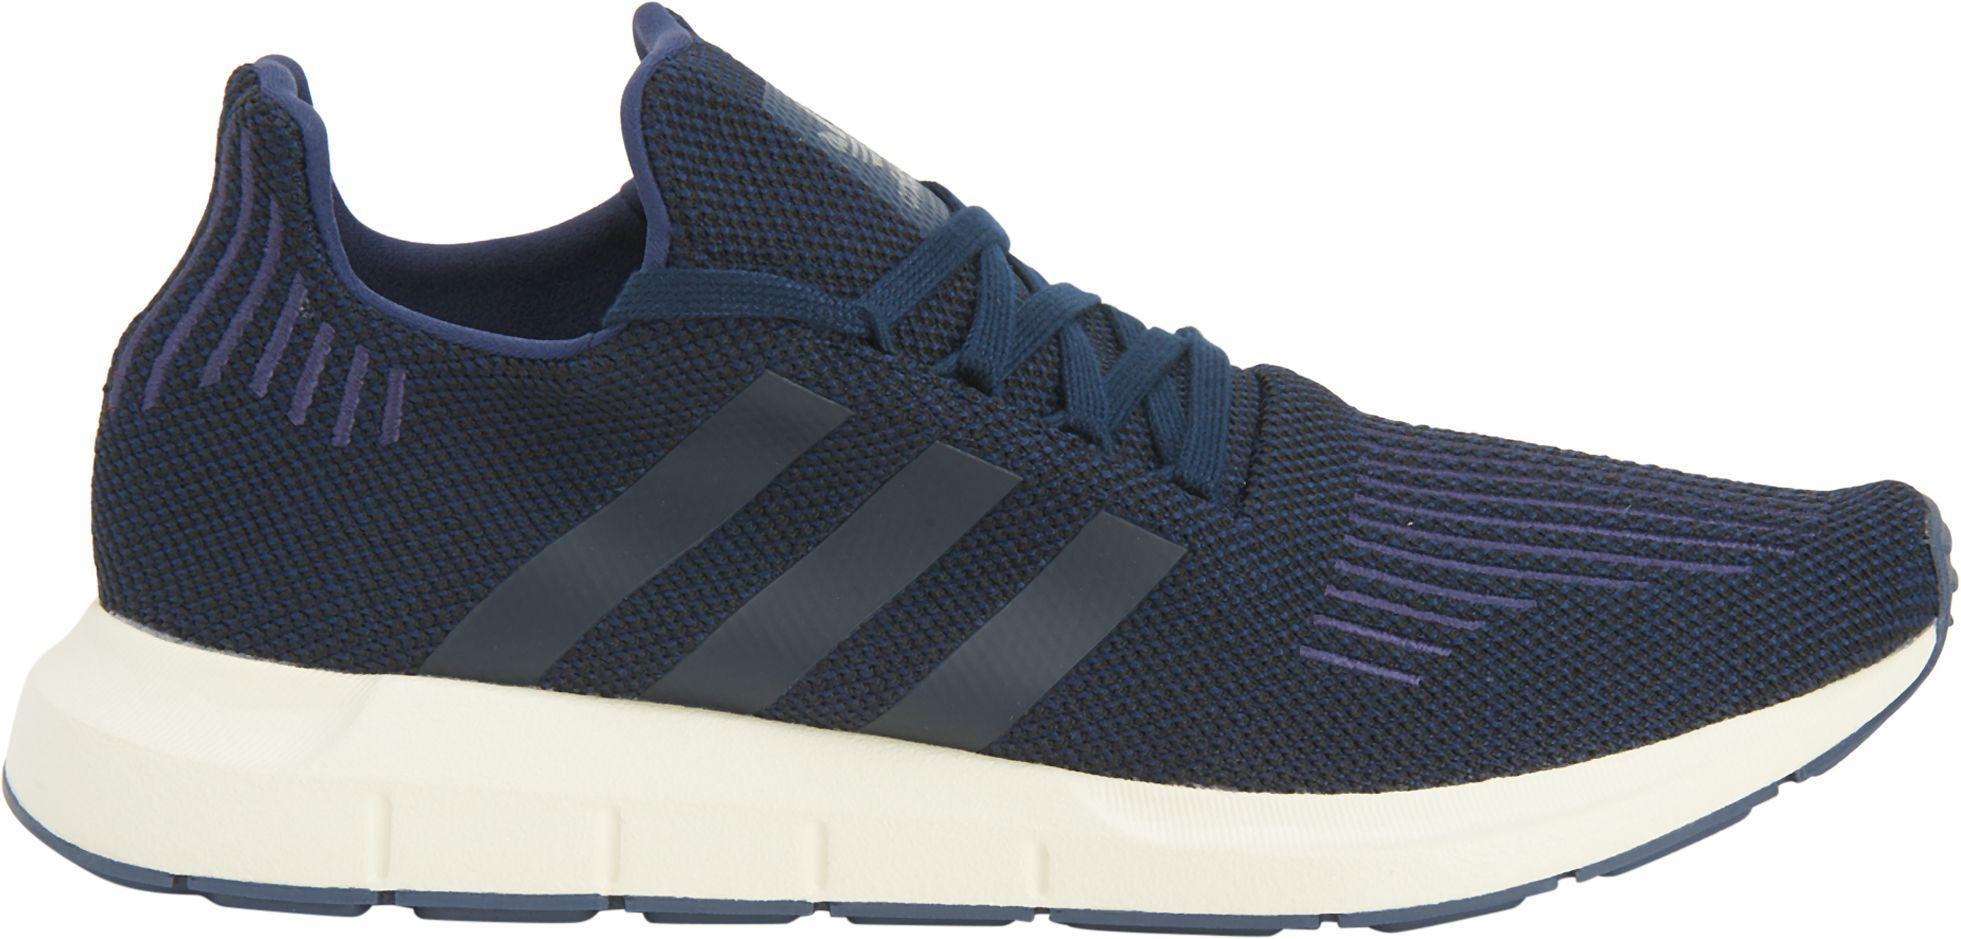 104614935db00 Lyst - adidas Originals Swift Run Shoes in Blue for Men